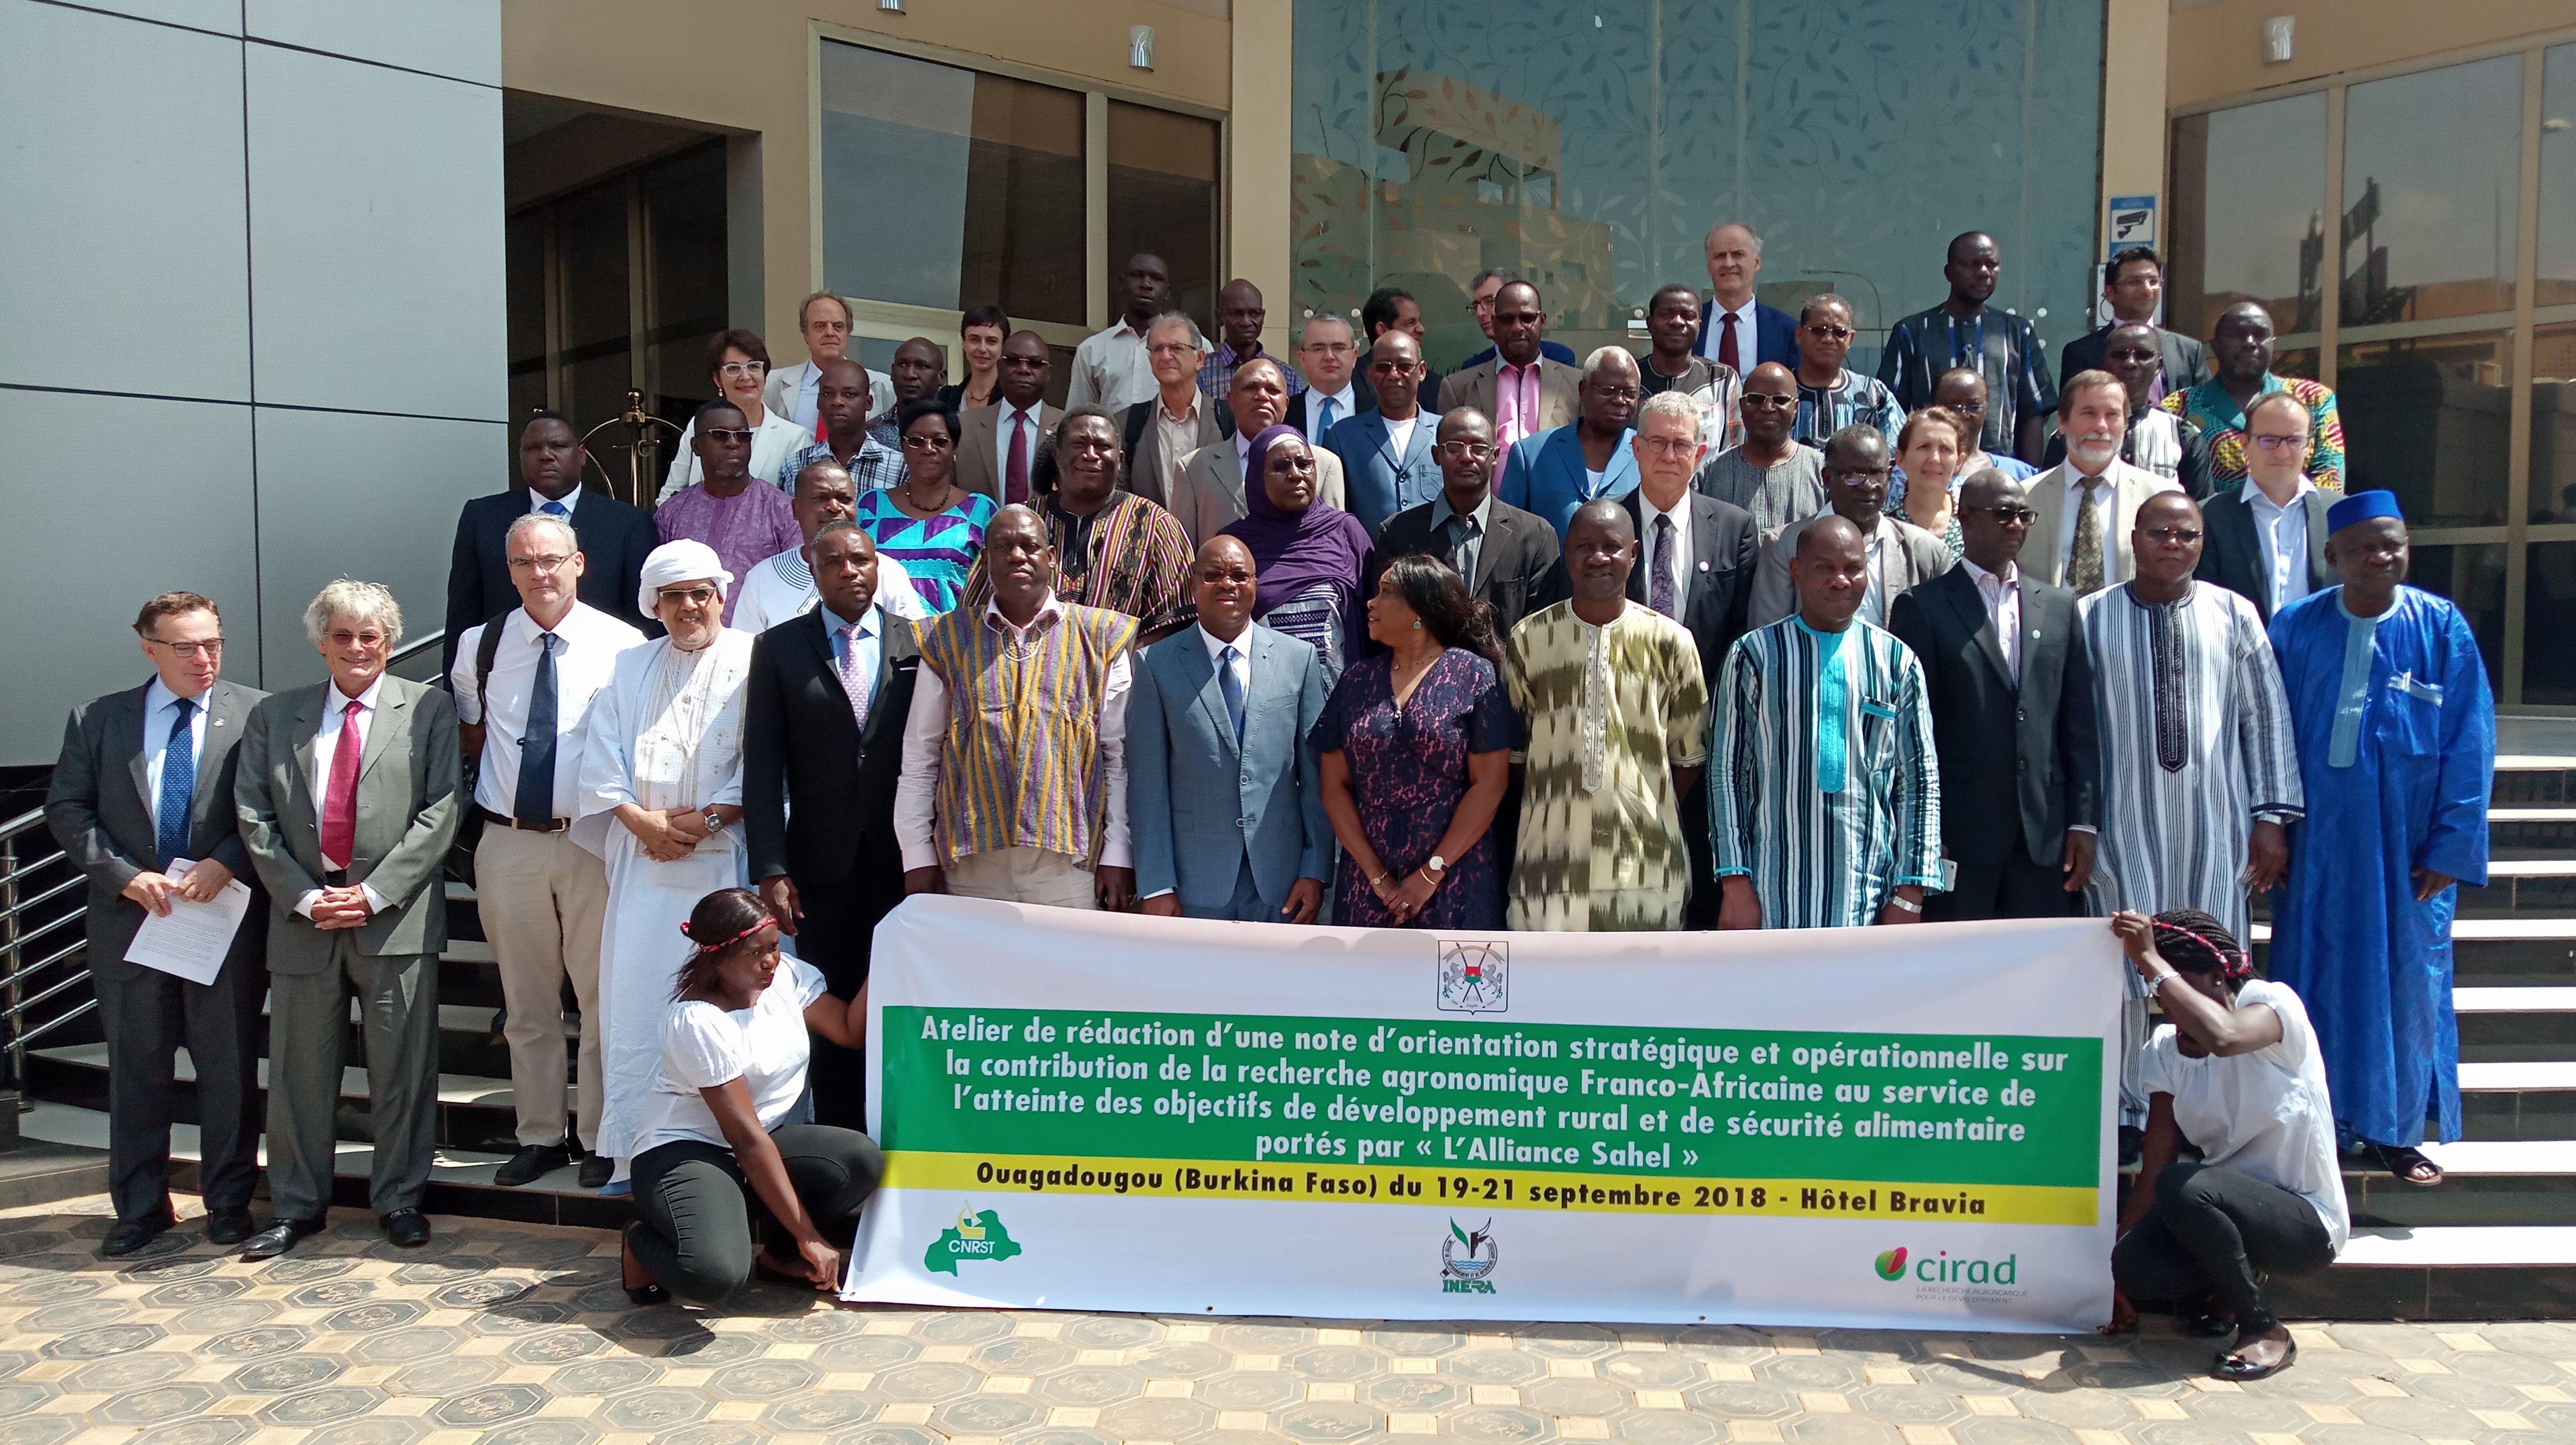 Participants in the Workshop Held to Draft the Ouagadougou Declaration de Ouagadougou